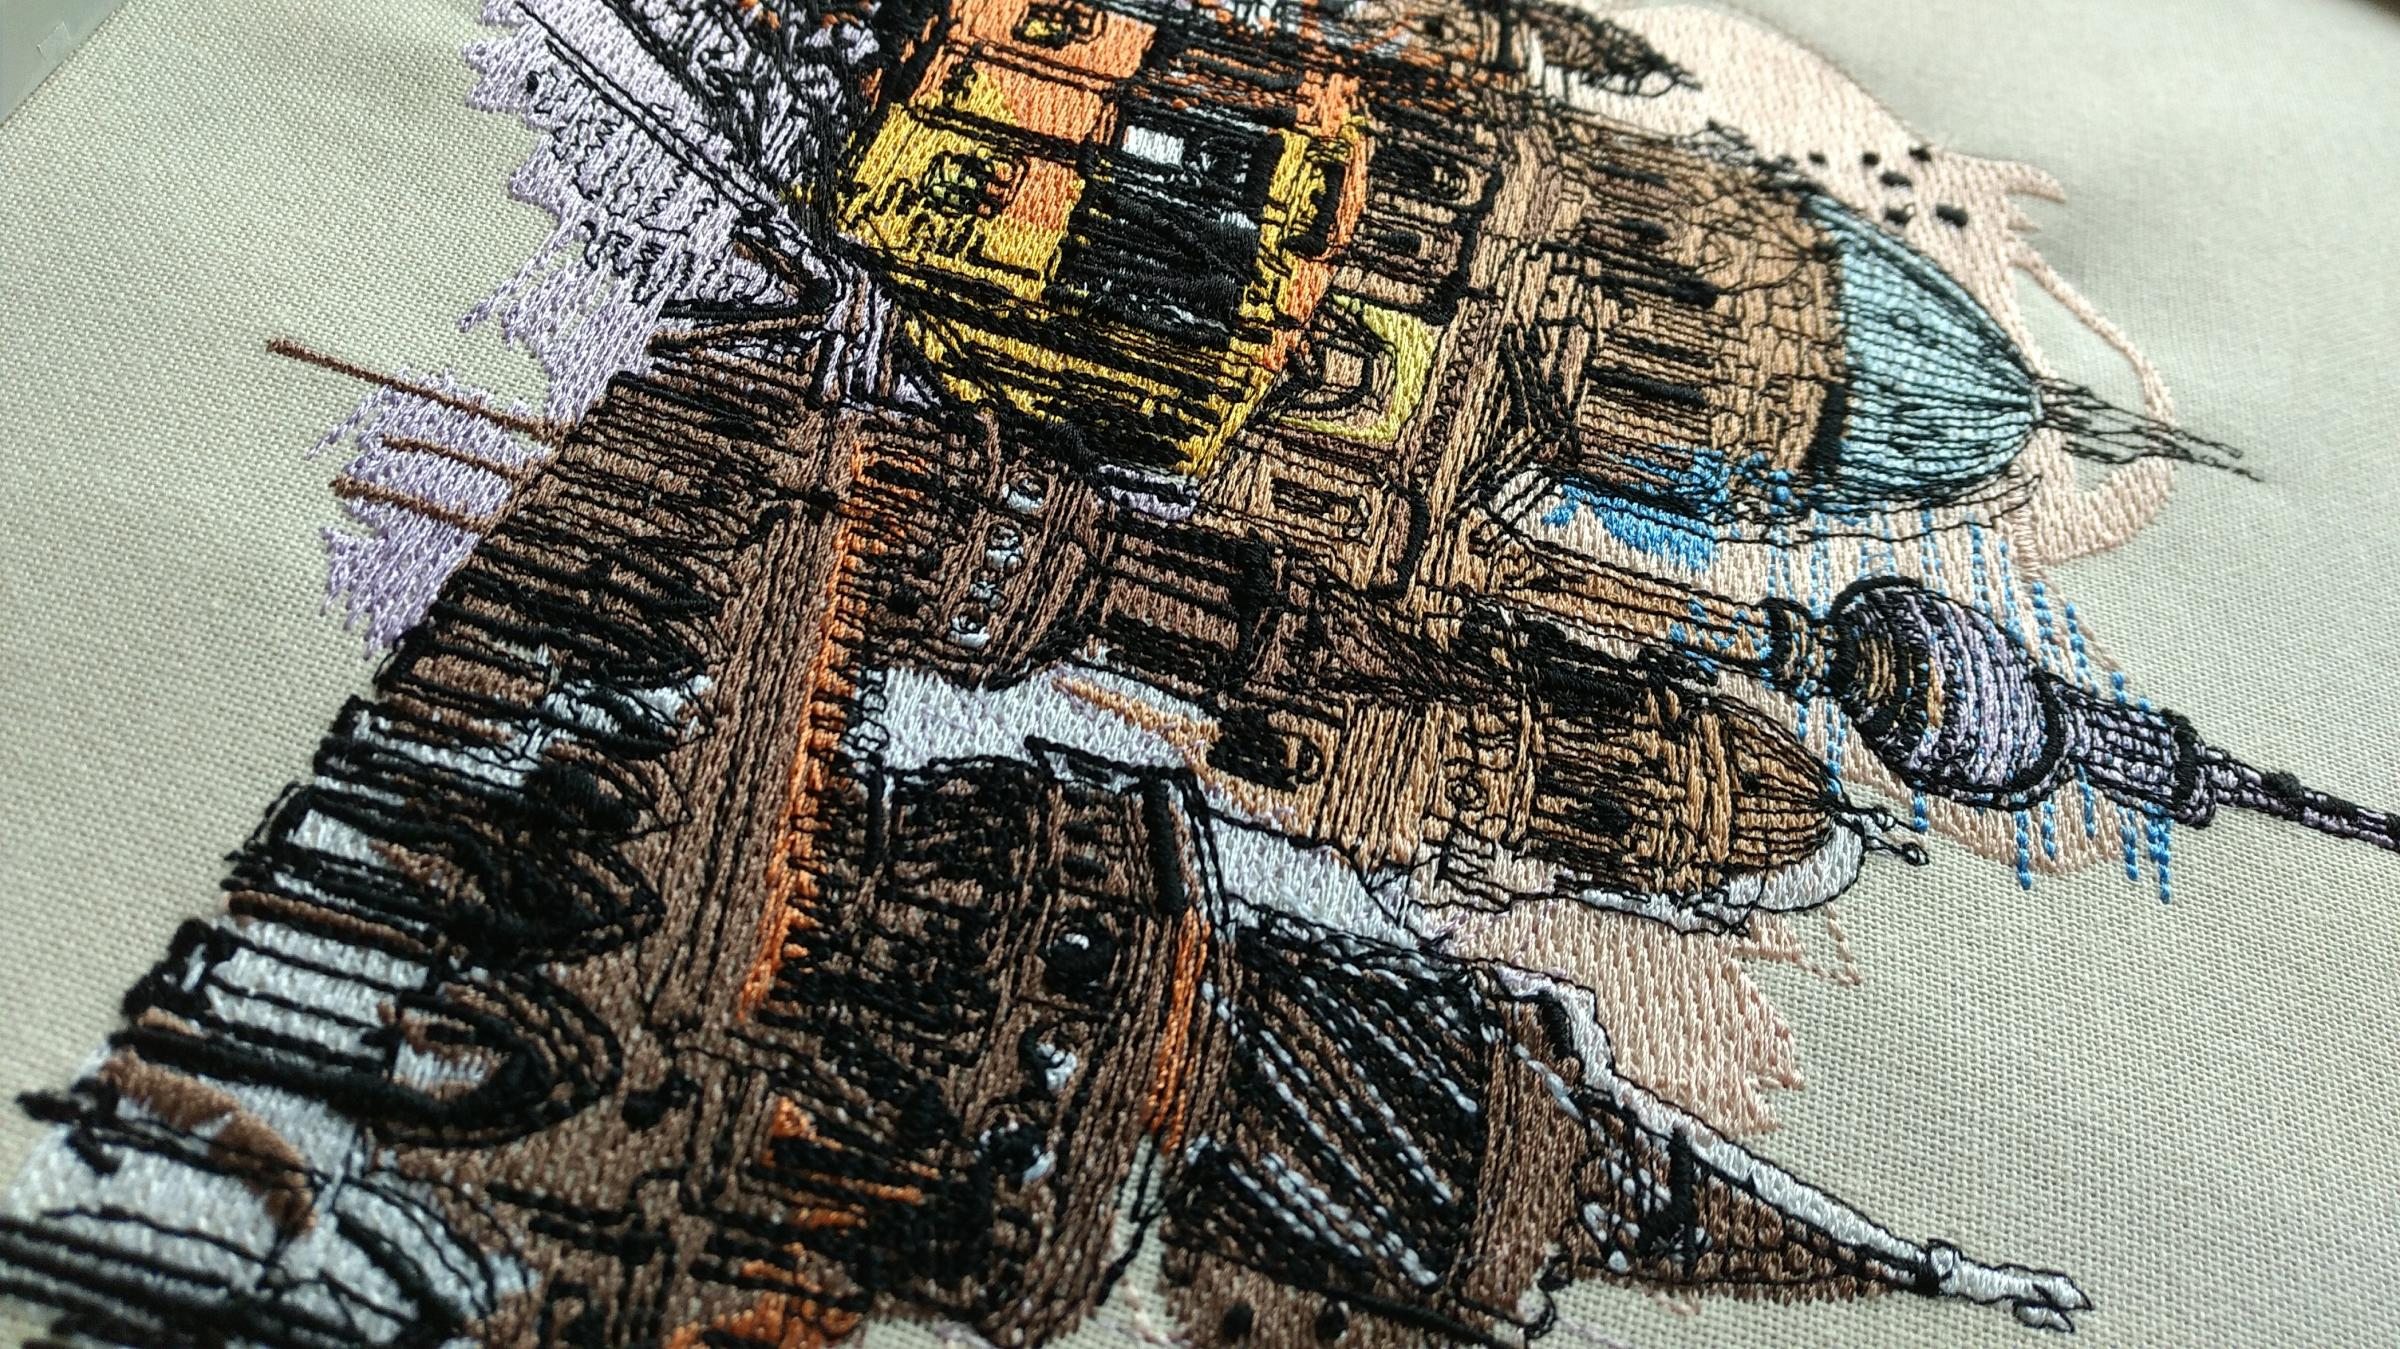 Berlin machine embroidery design